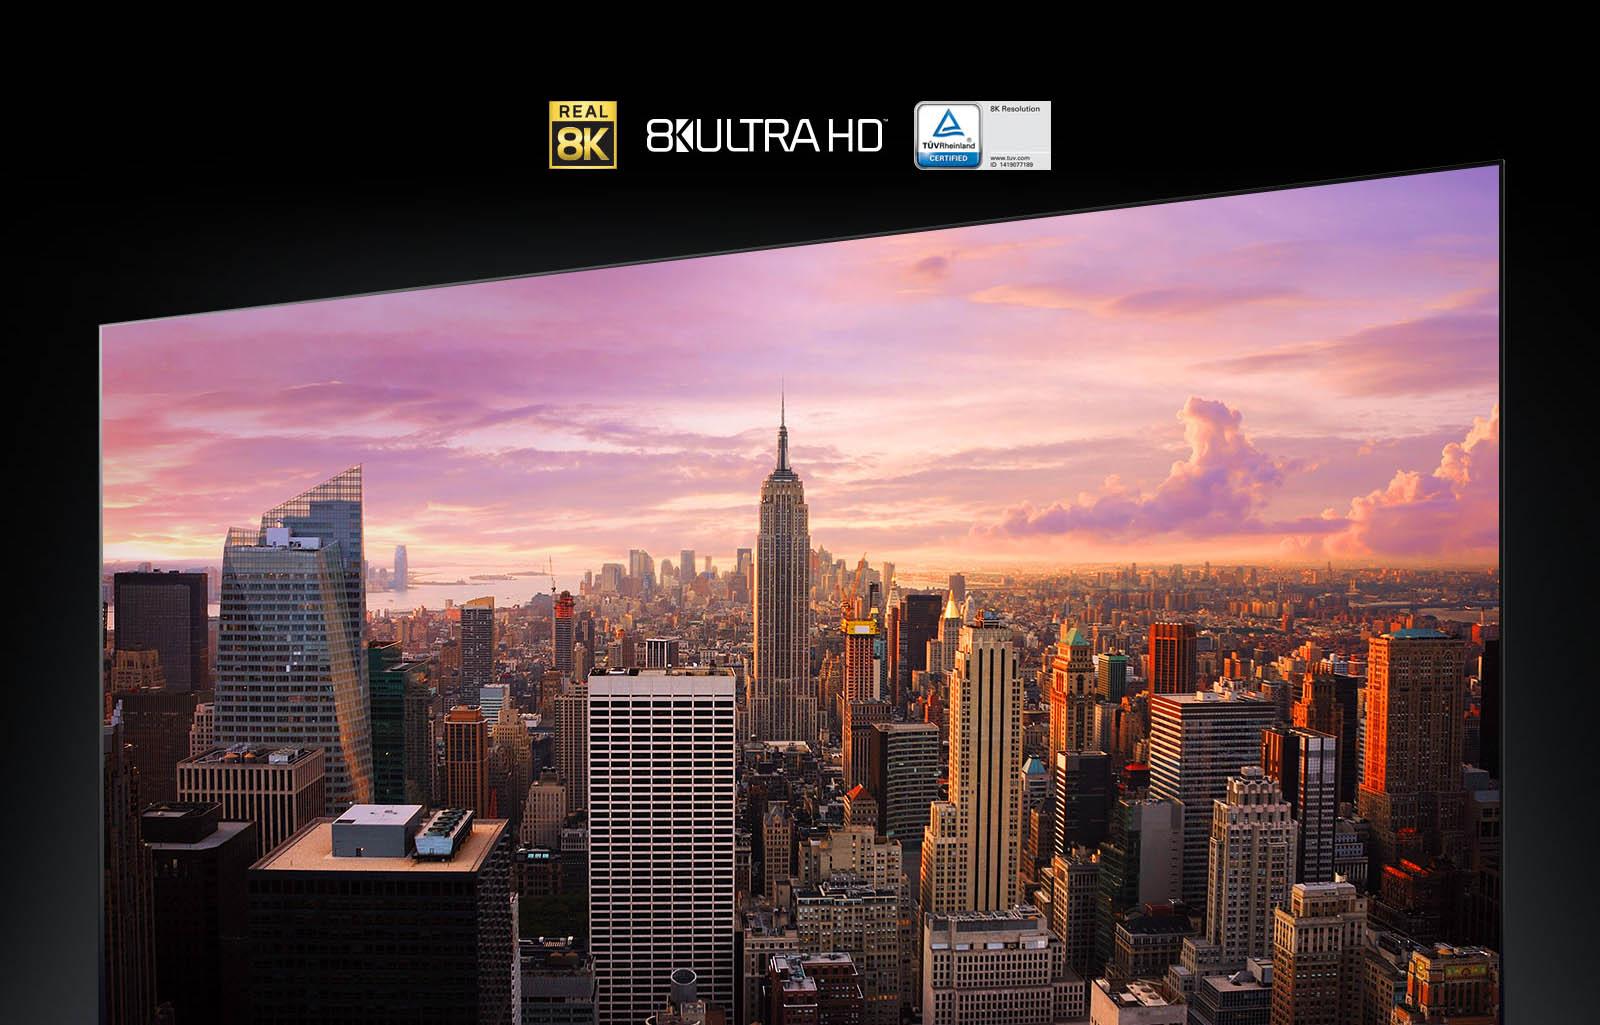 TV-SIGNATURE-OLED-77-ZX-03-OLED-8K-NonUS-Desktop.jpg (1600×1025)